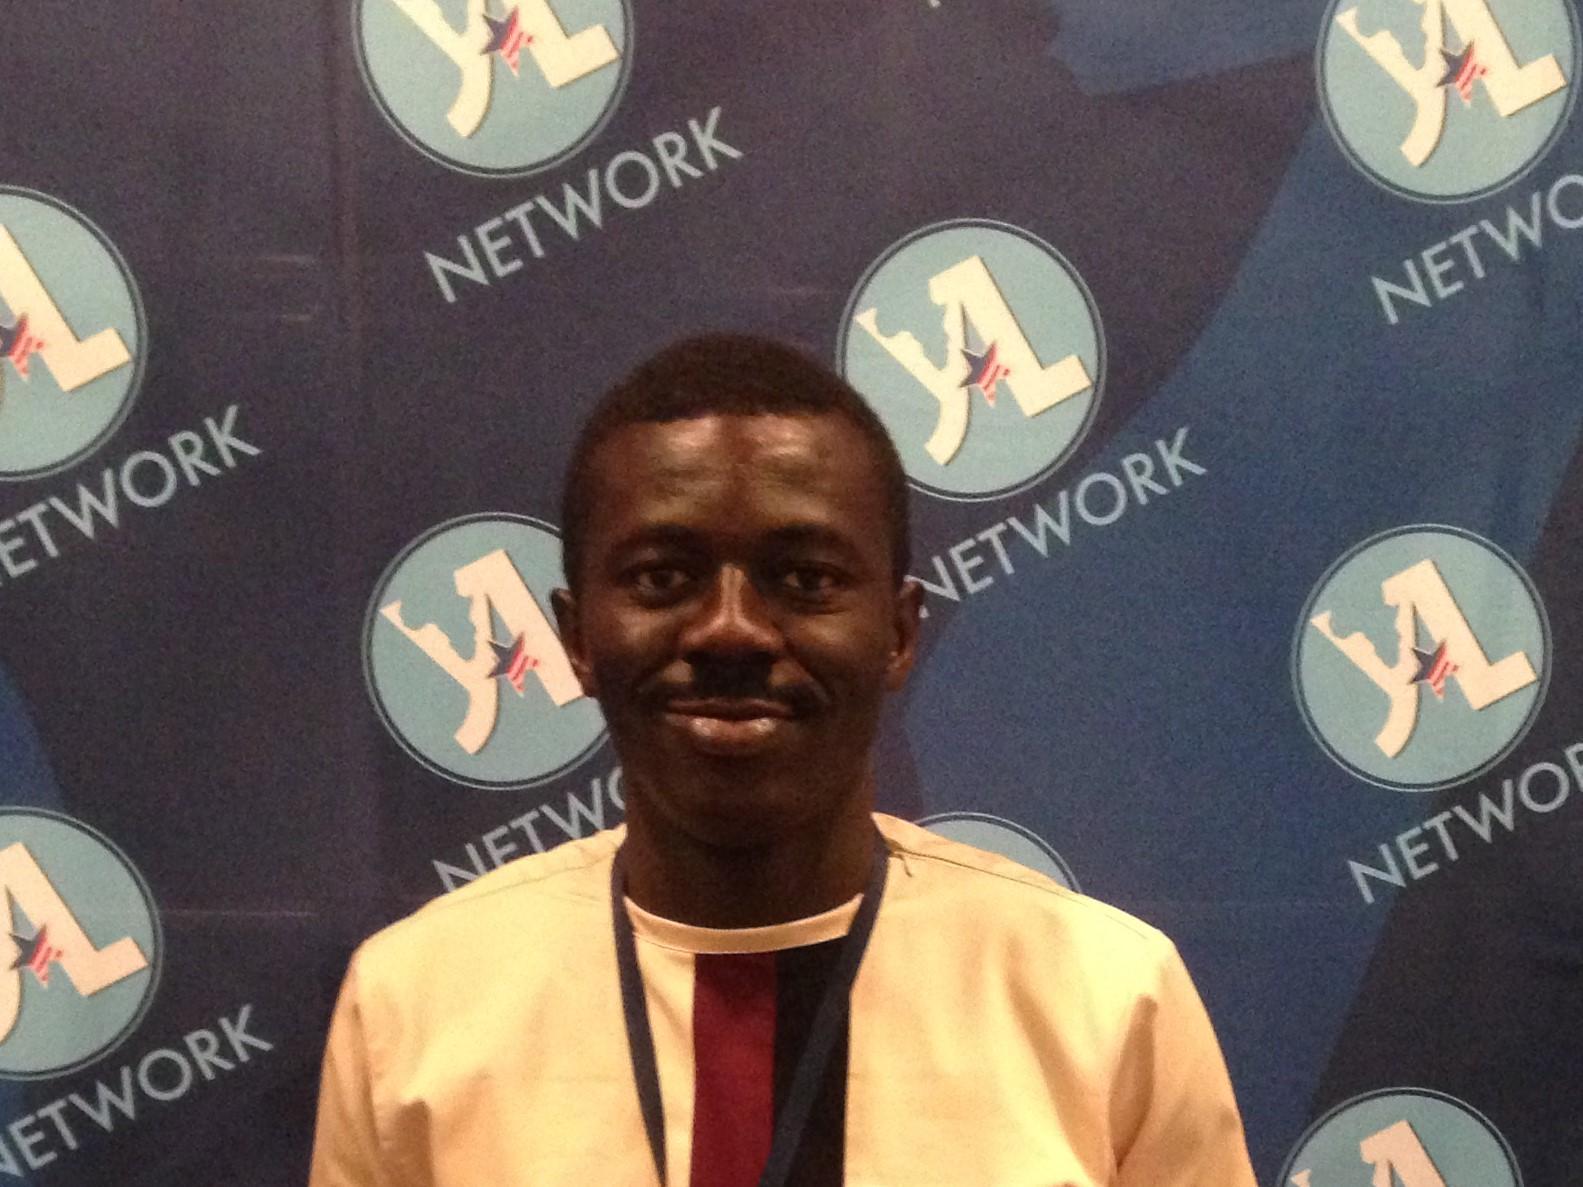 Reginald Nsowah, CoFounder of Ticketmiller, Ghana